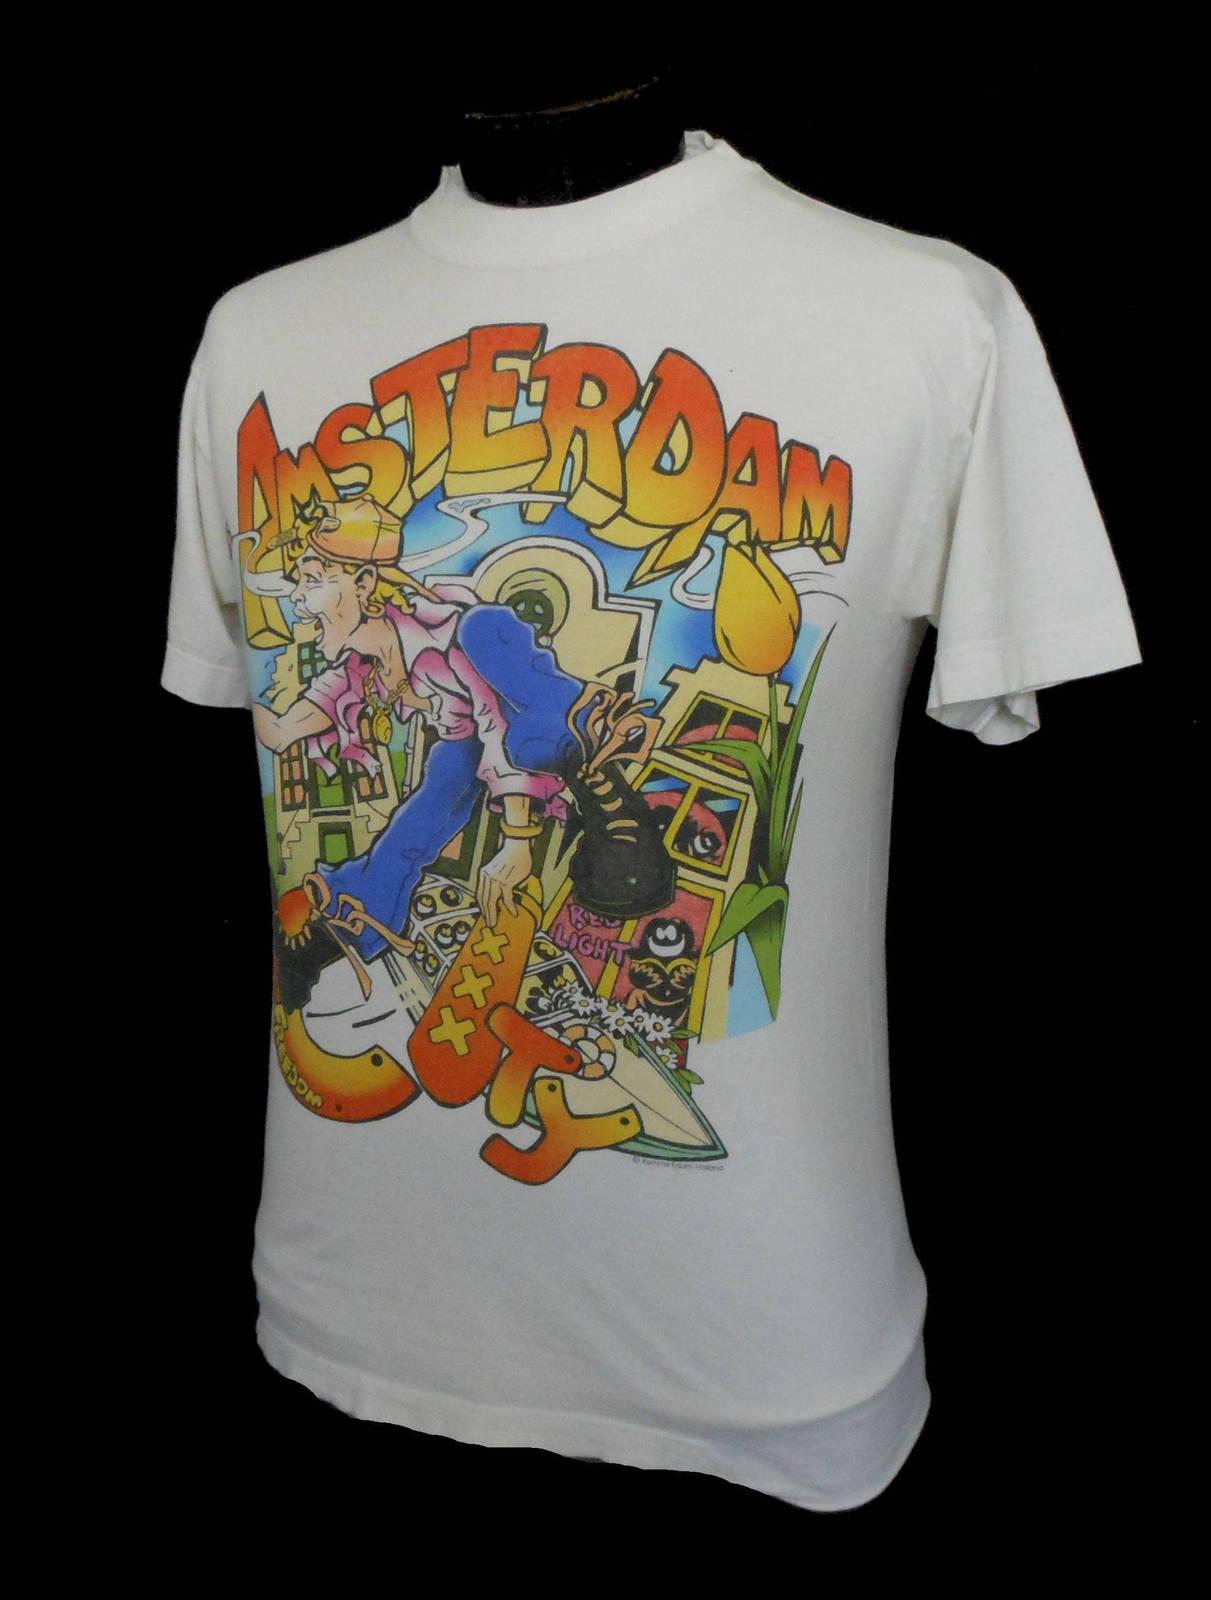 b75641b41 Vintage 70s 80s Amsterdam Souvenir T-Shirt Head Crewneck Tee, Size Small  Medium